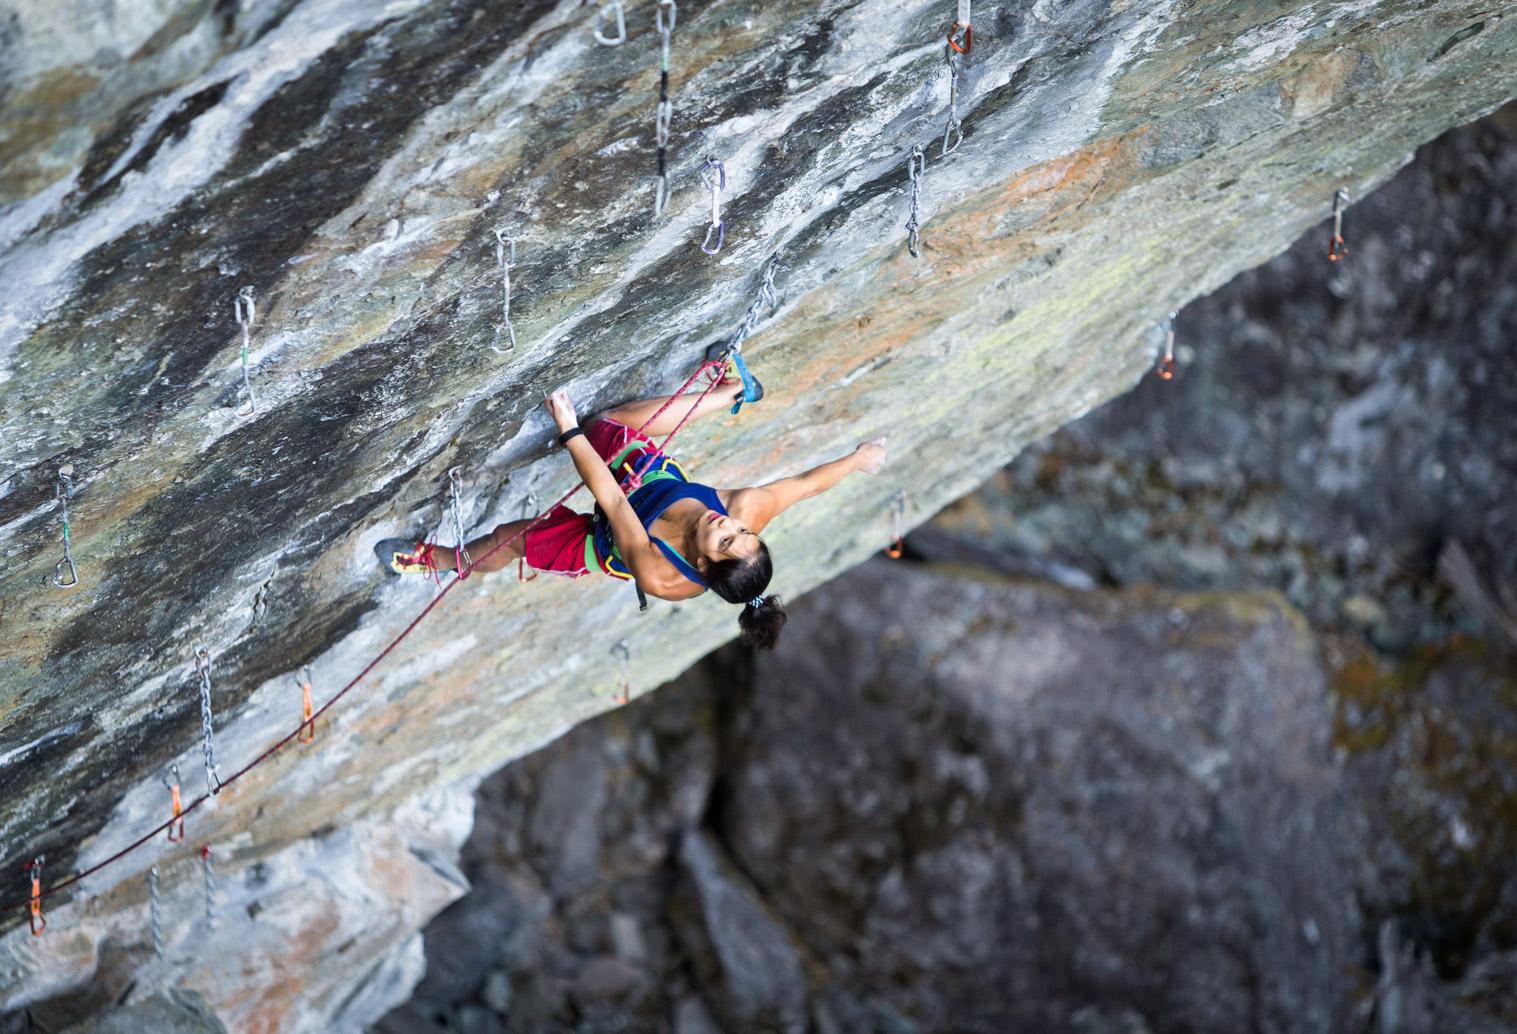 Squamish Rock Climbing - Alannah Yip, The Pulse 14a